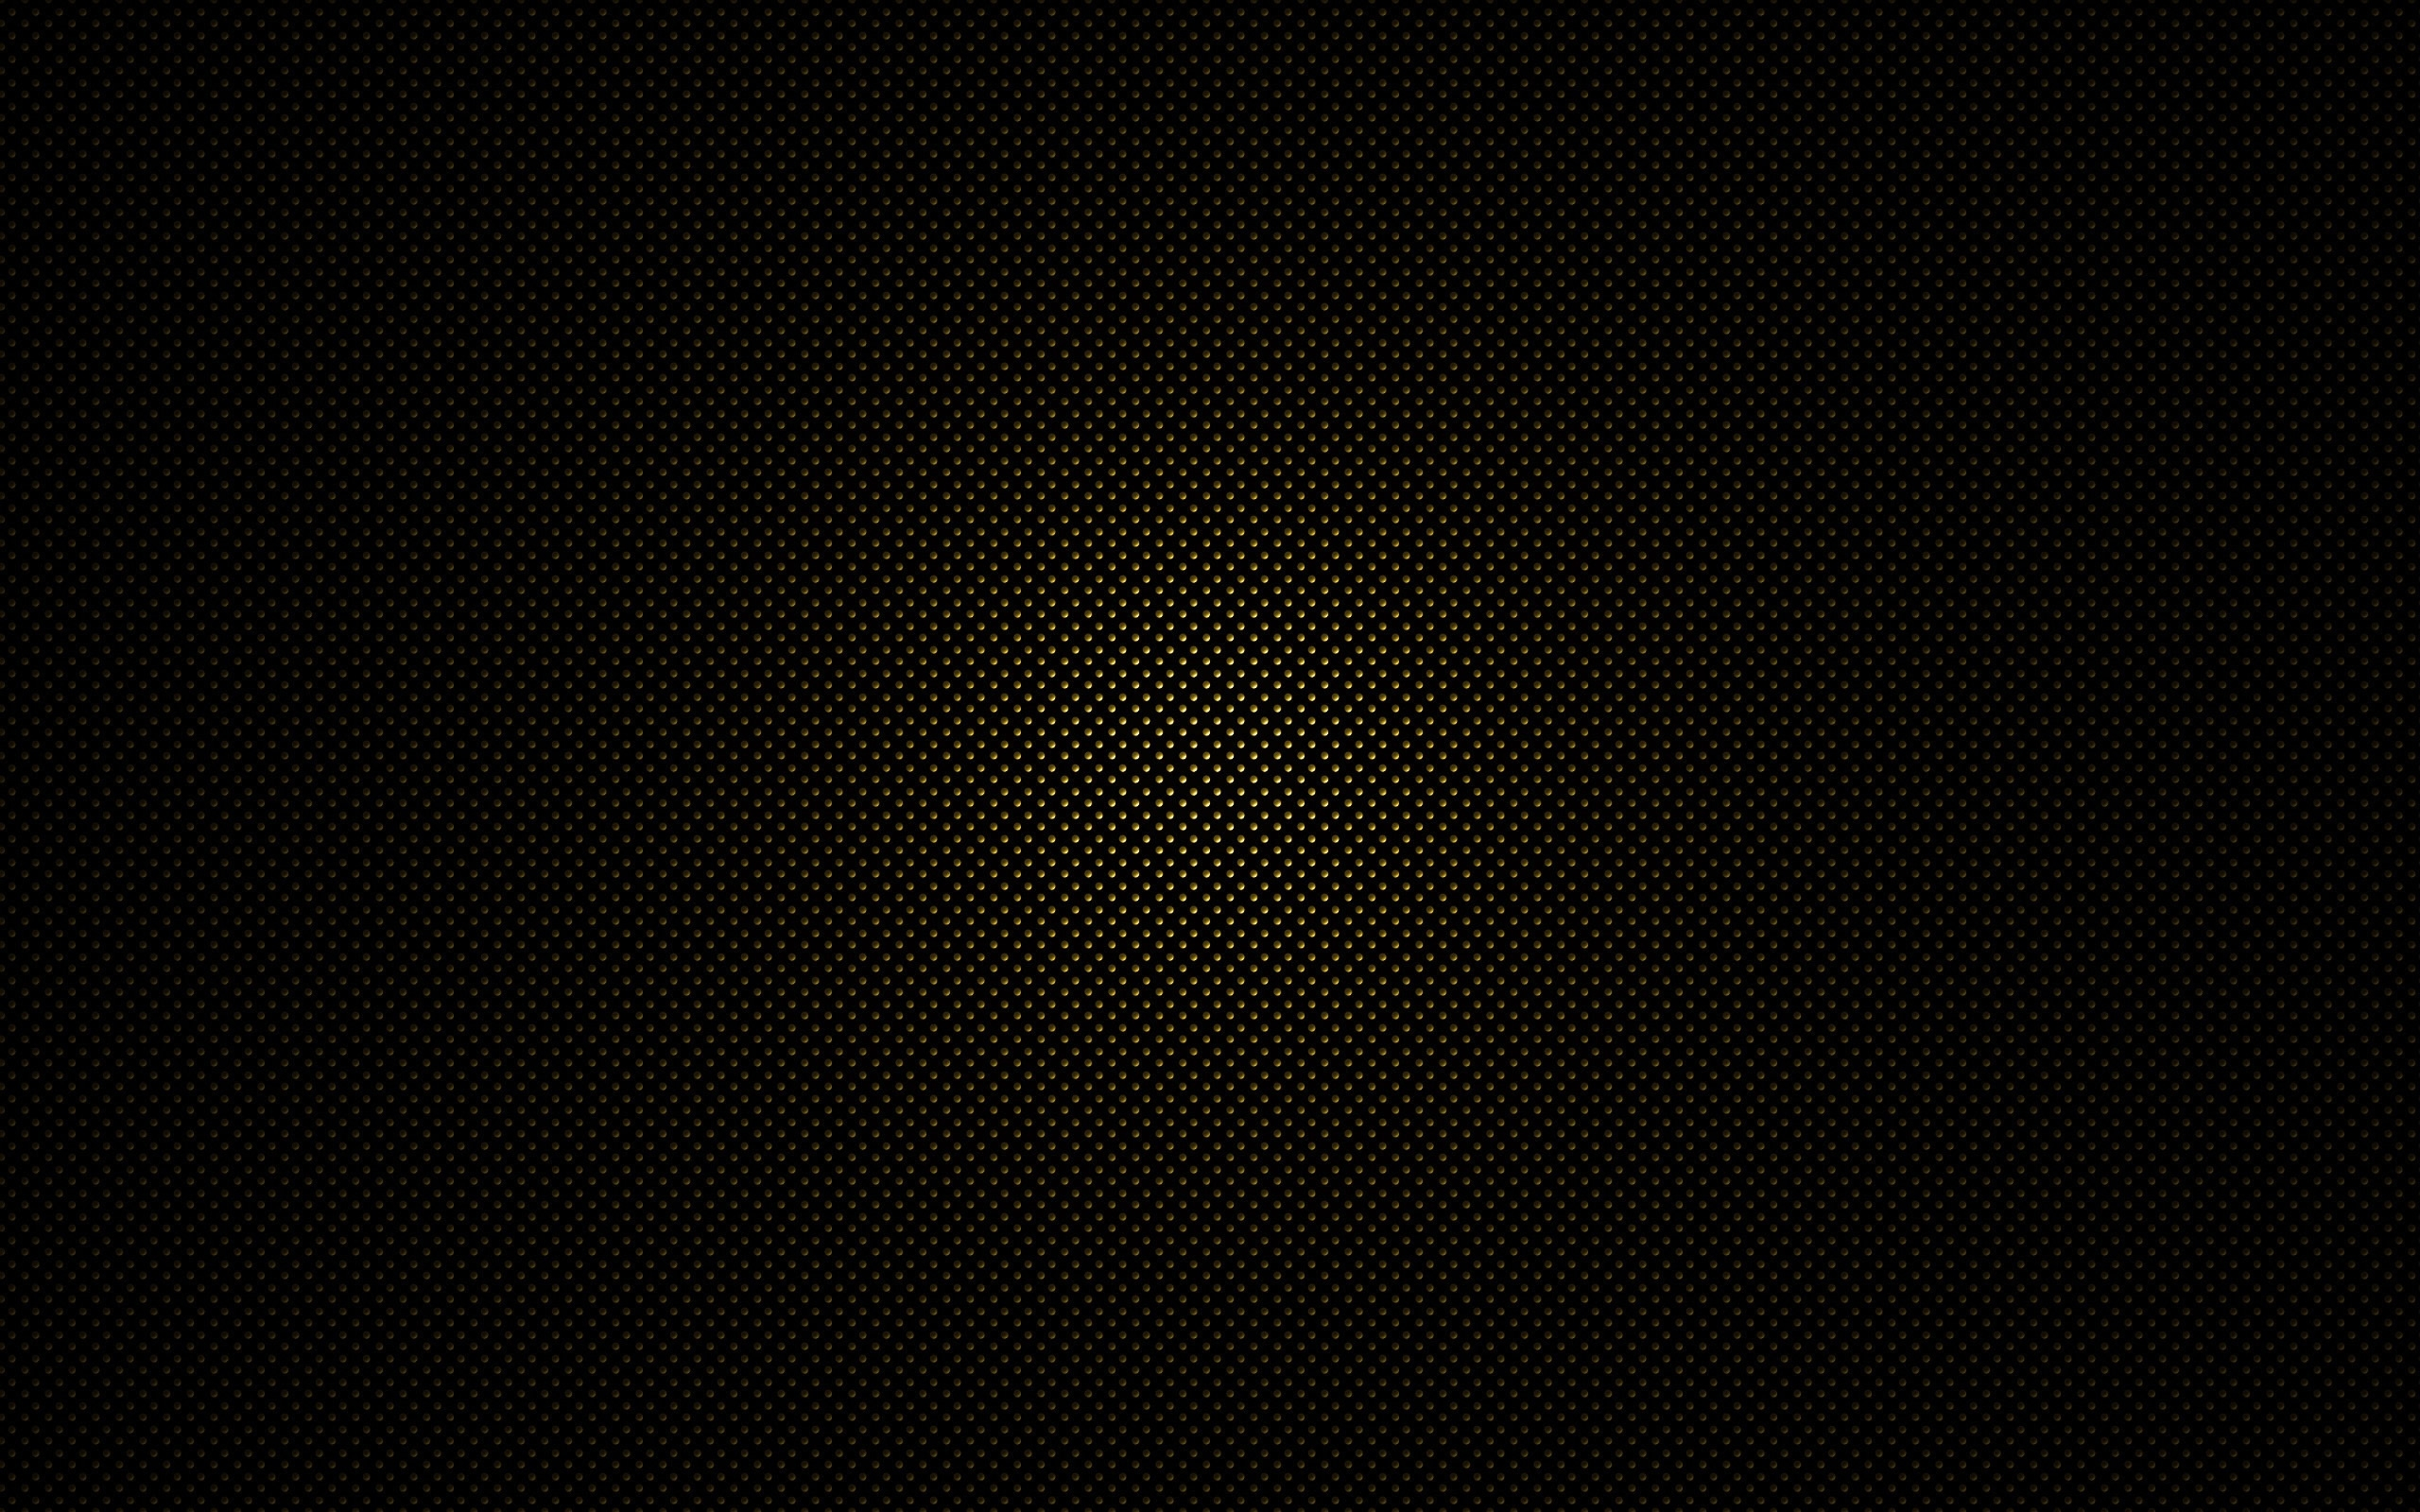 Golden Pins Mac Wallpaper Download Mac Wallpapers Download 2560x1600